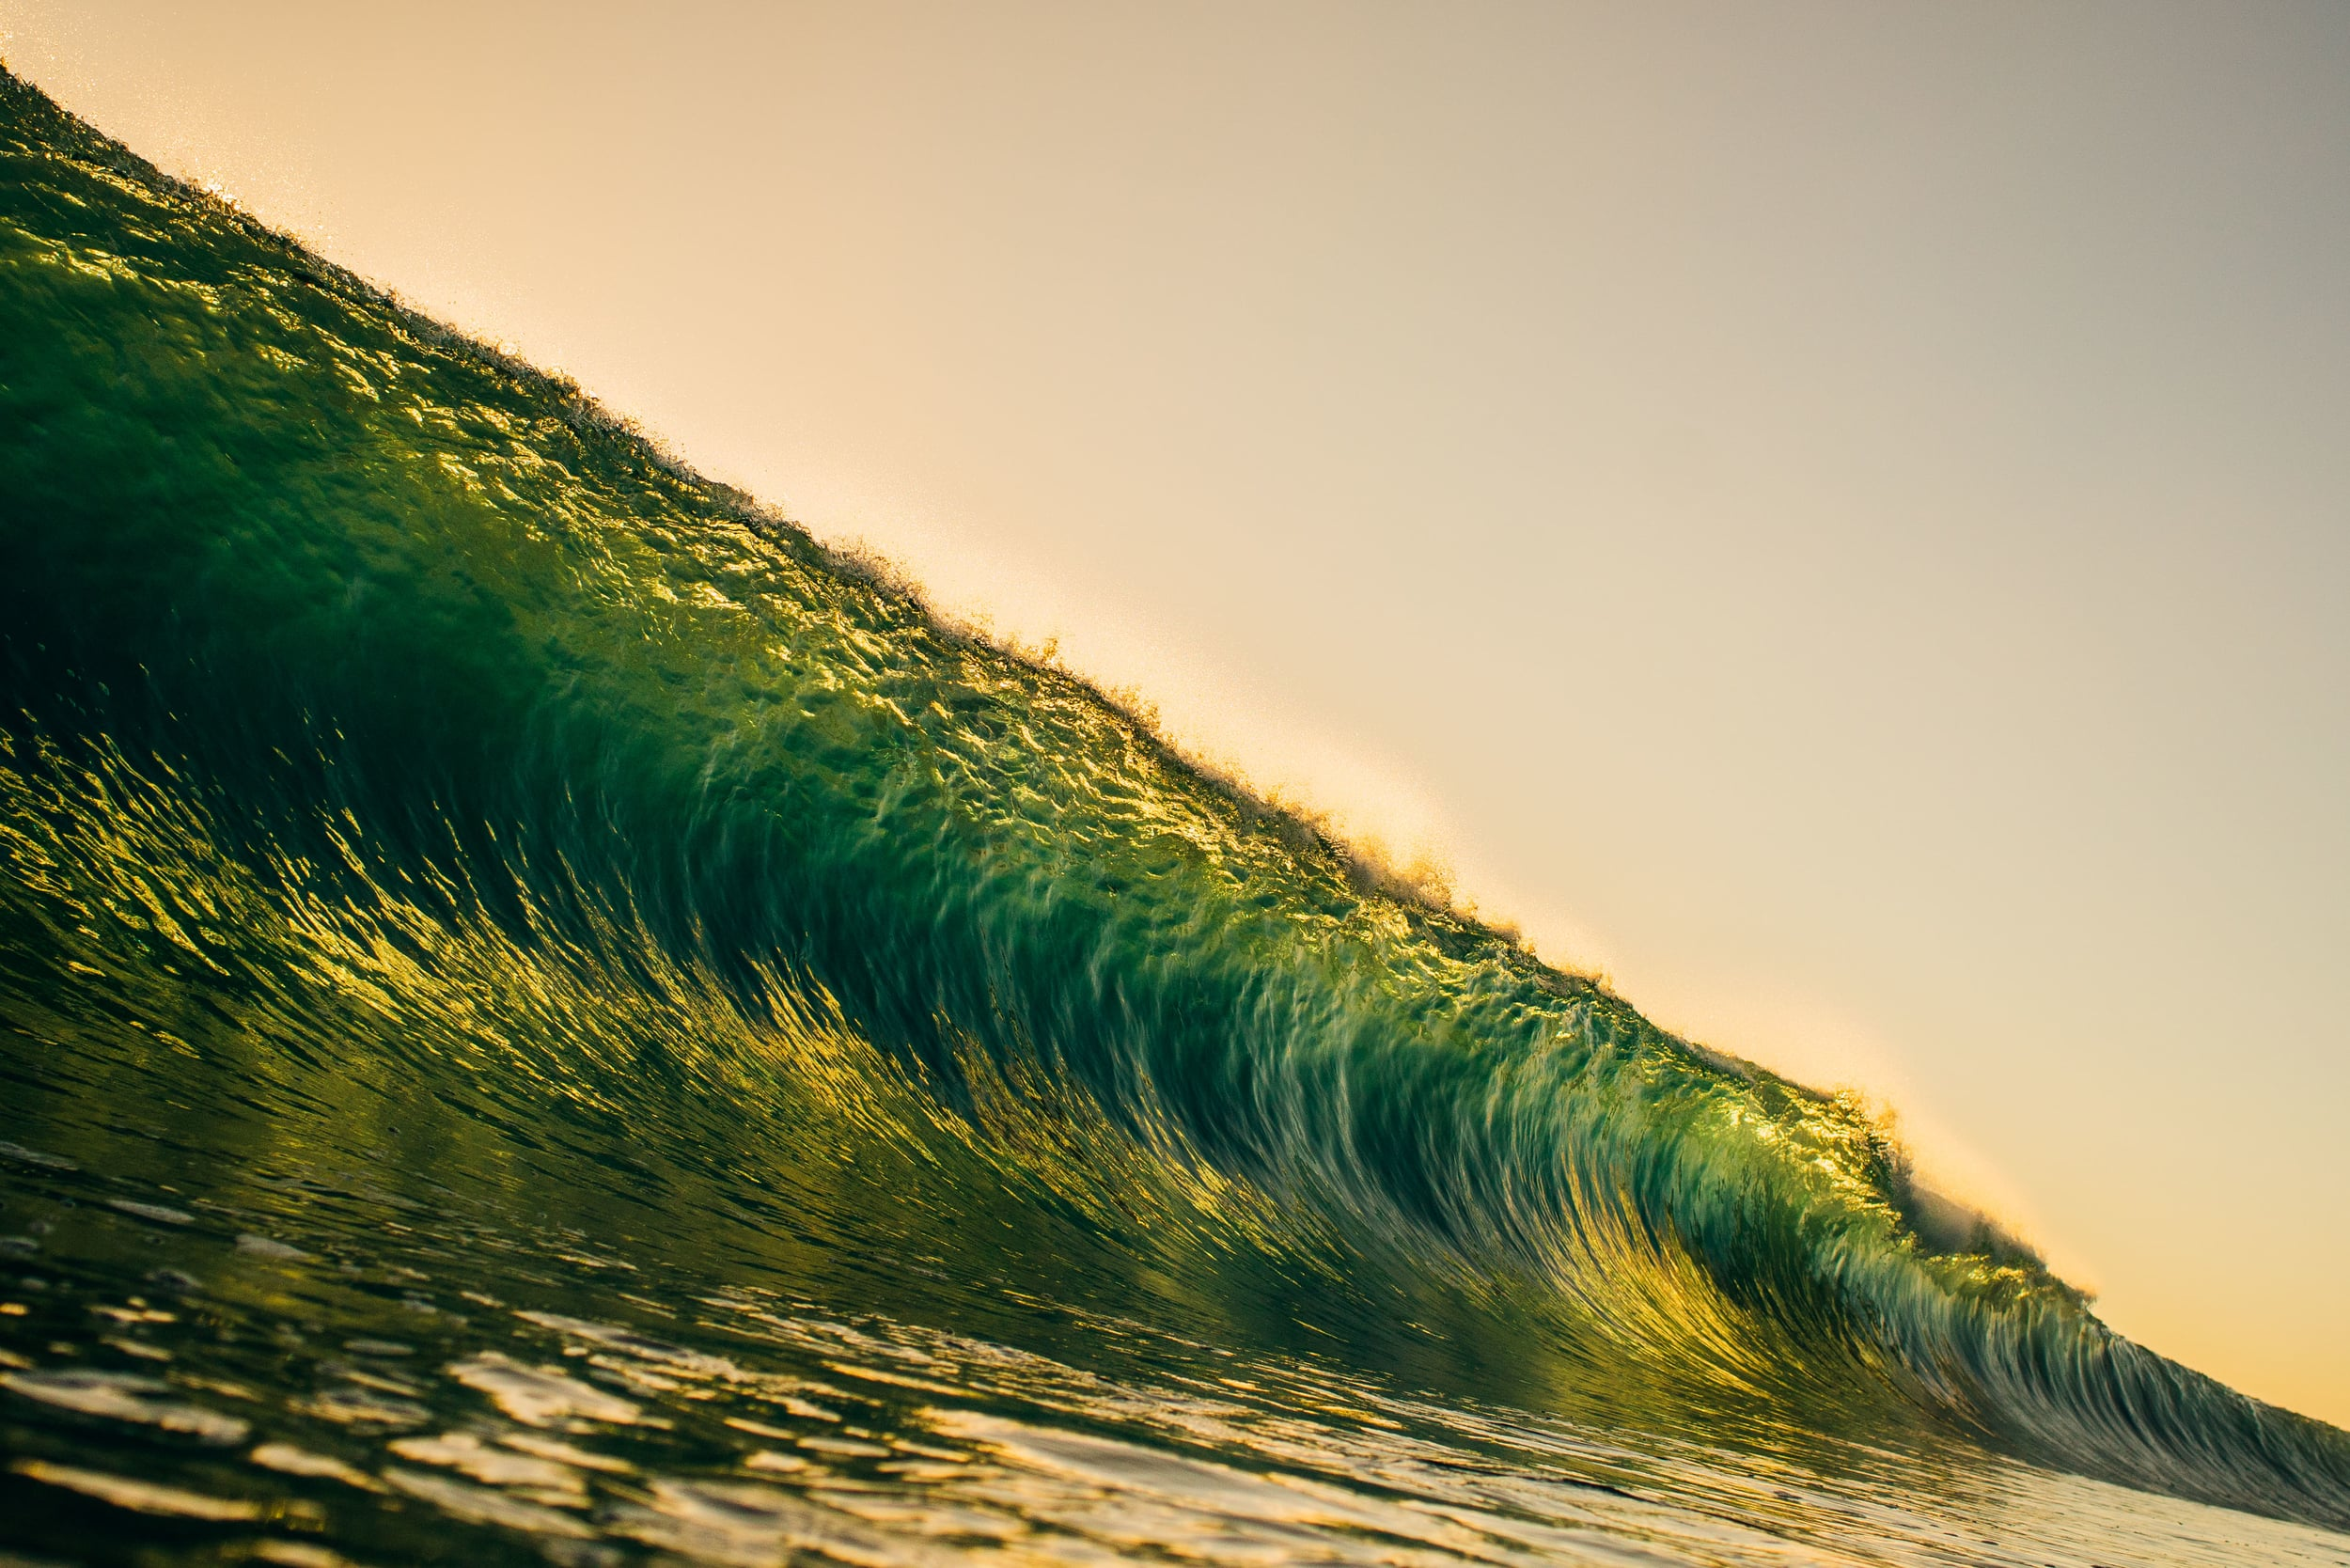 bryce-johnson-photography-kauai-hawaii-surfing-a7rii-aquatech-water-ocean-3.jpg